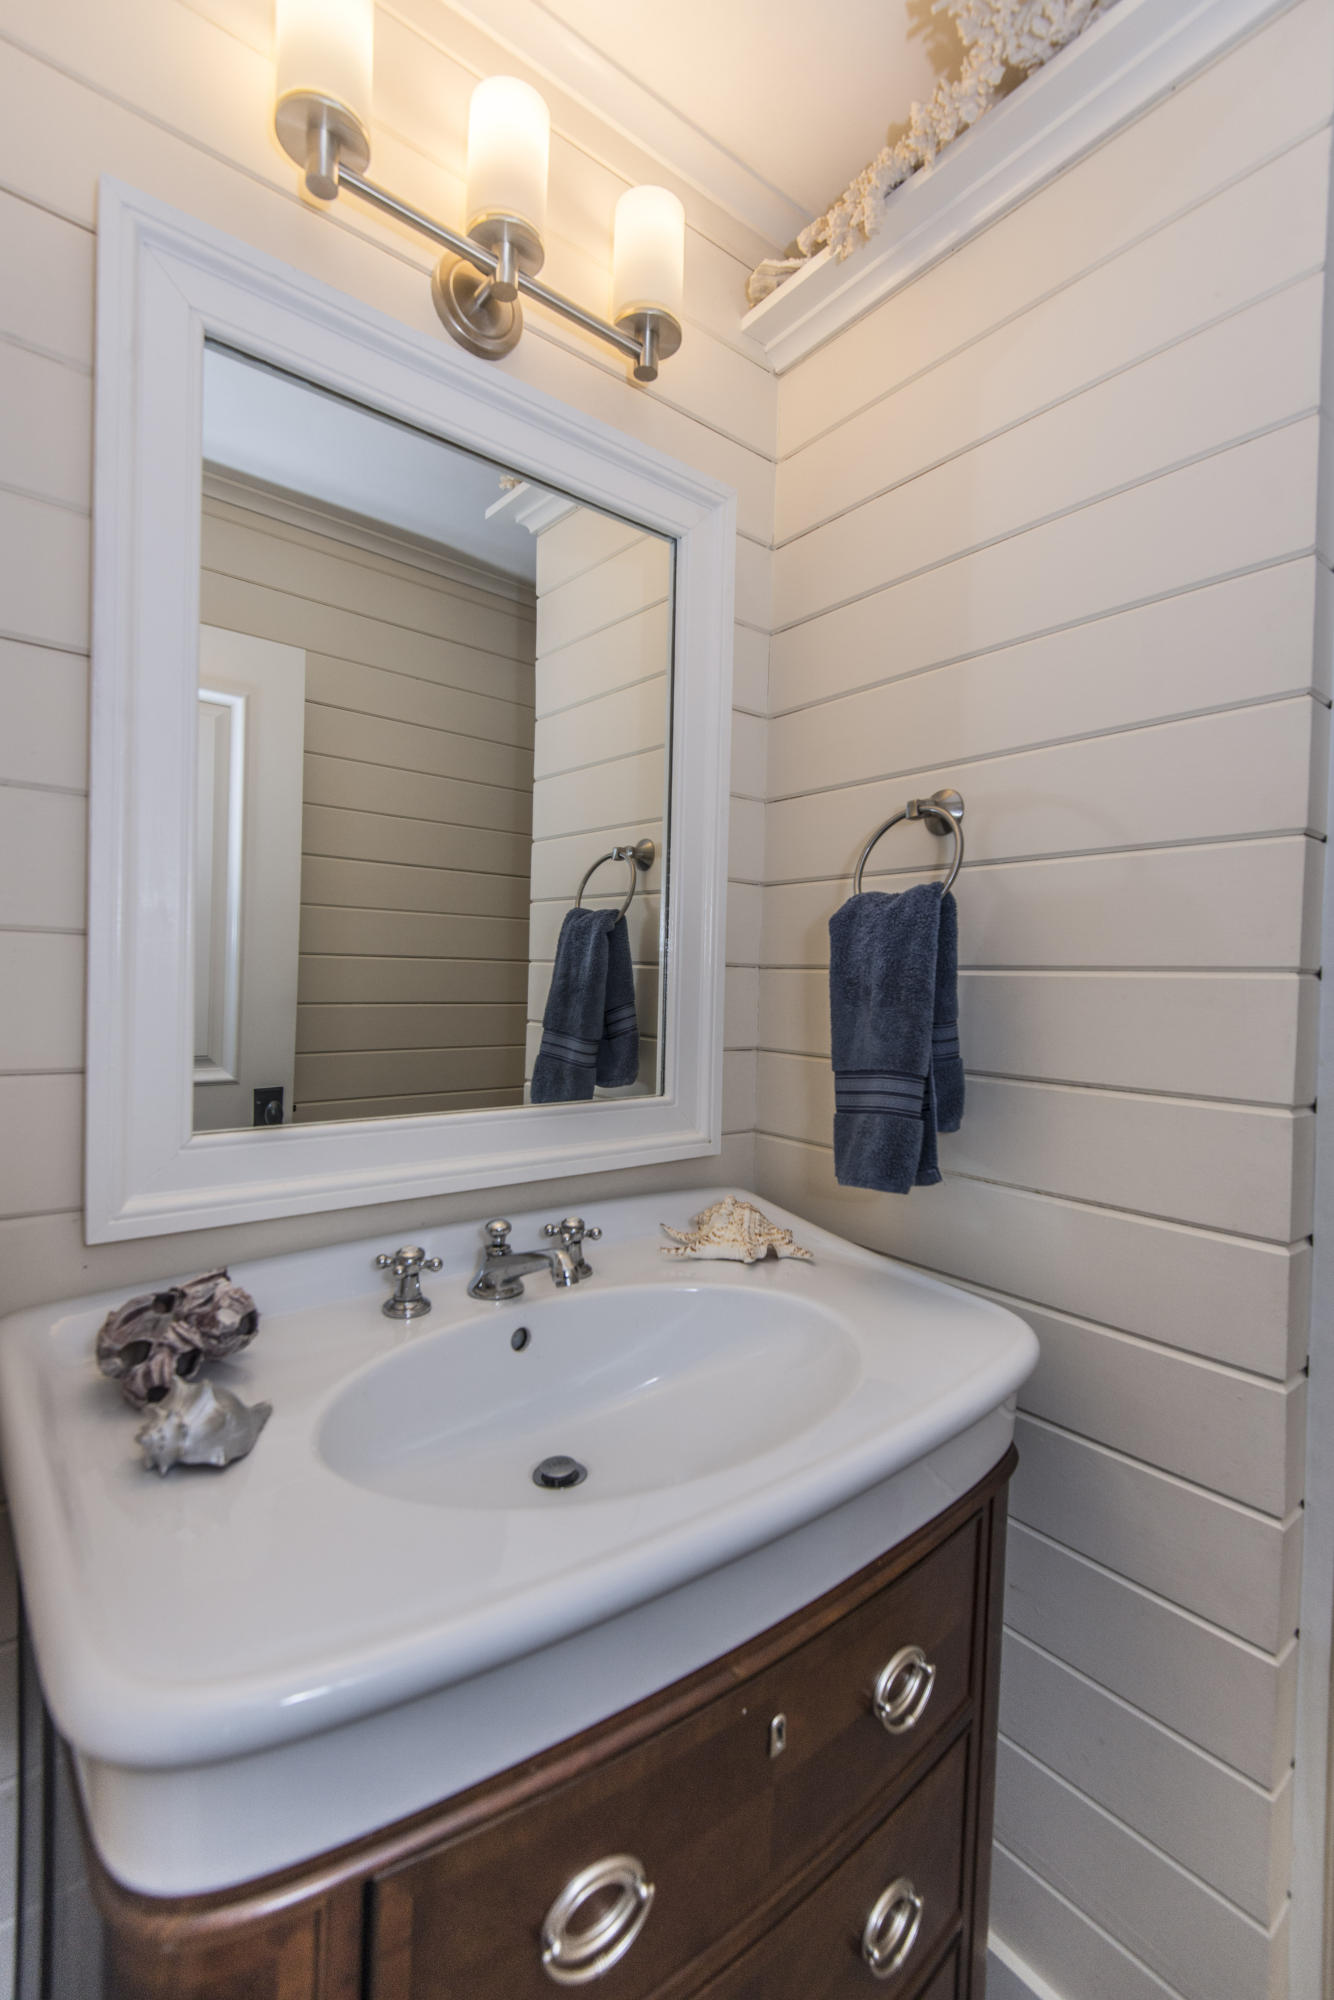 Wappoo Creek Place Homes For Sale - 43 Wappoo Creek, Charleston, SC - 26